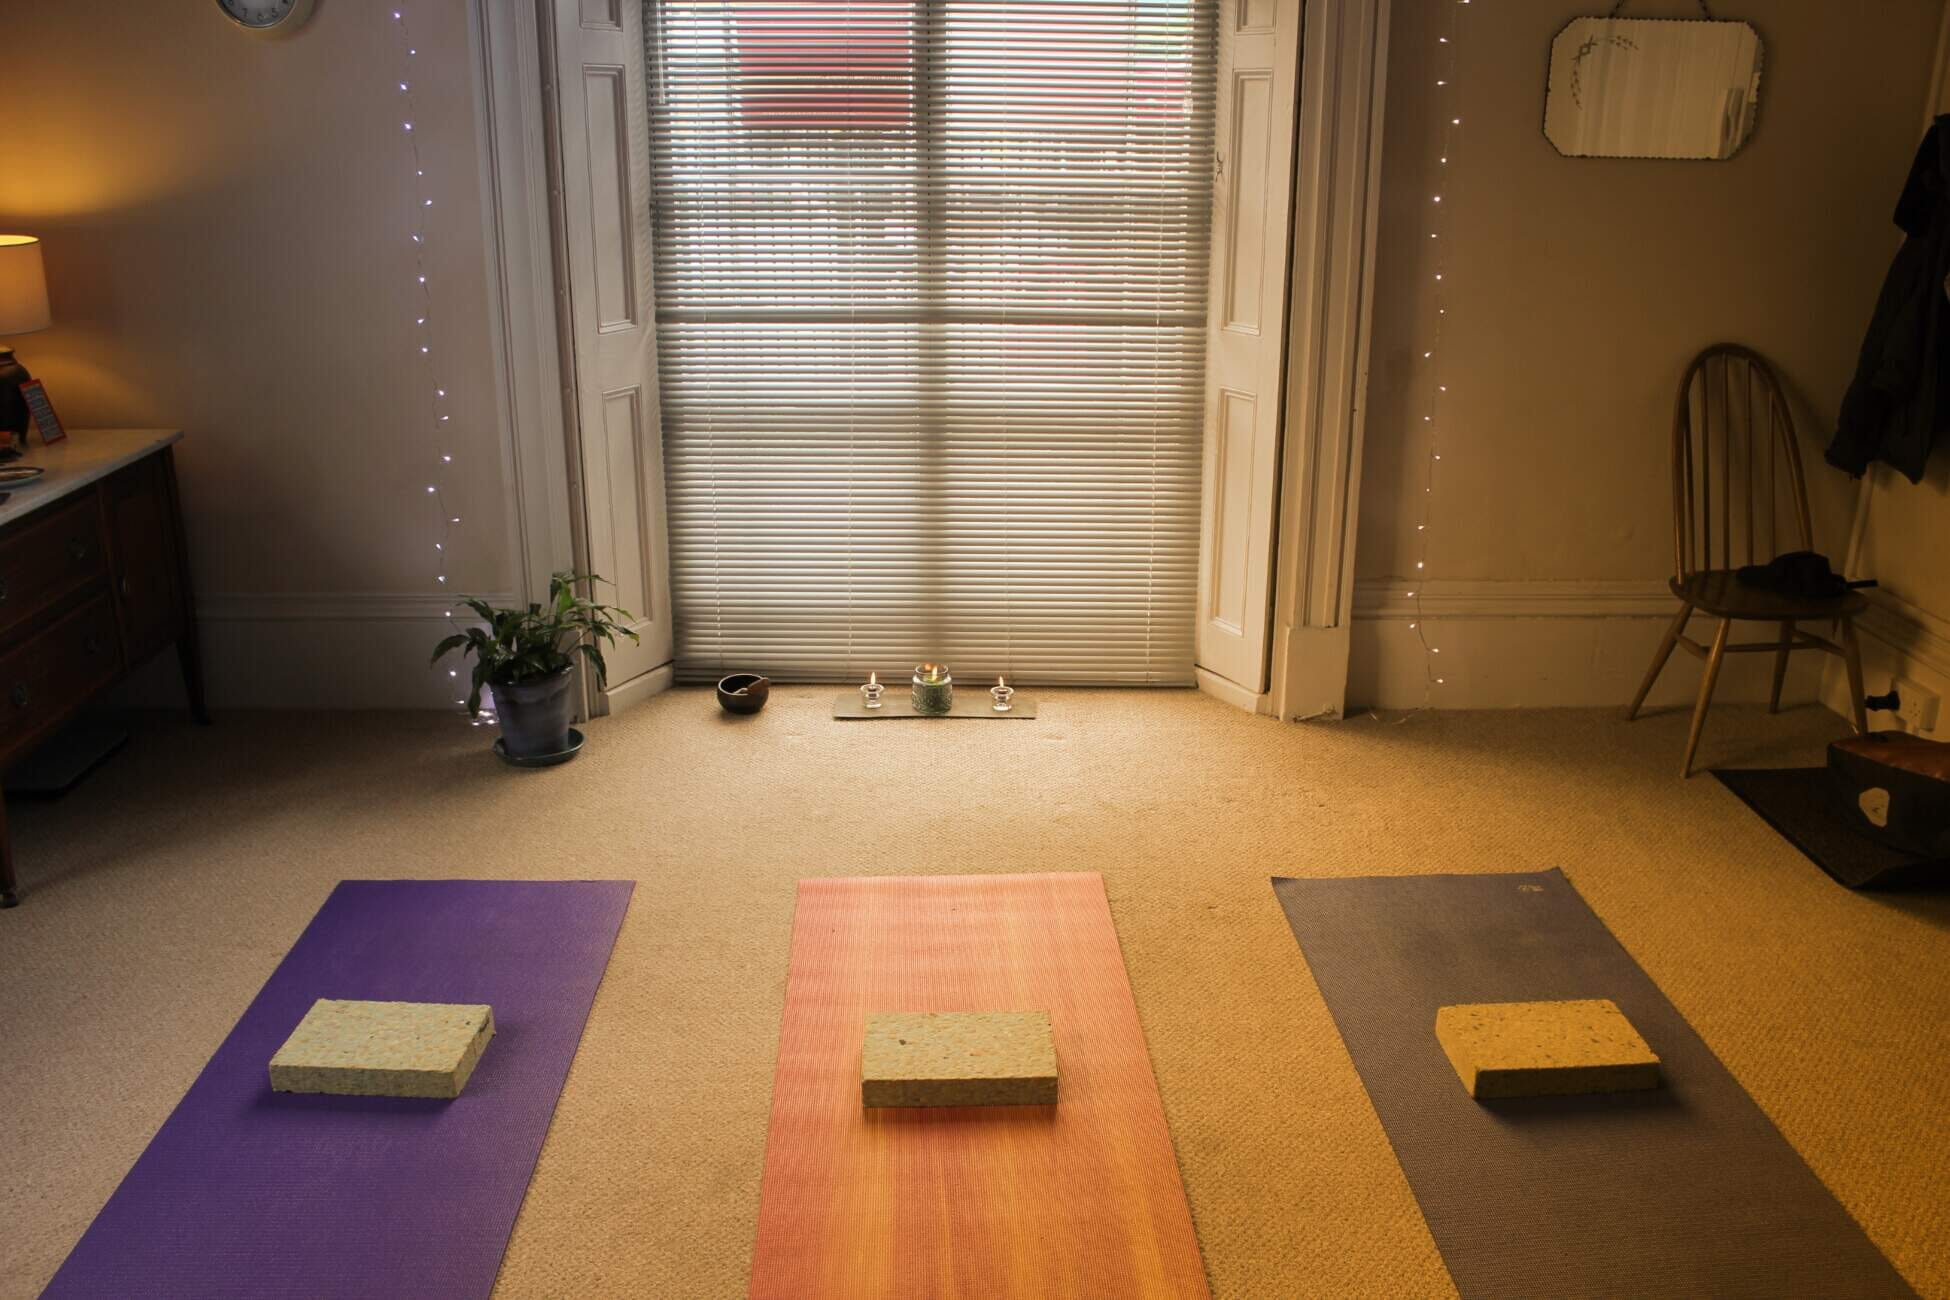 Yoga studio and mats 2